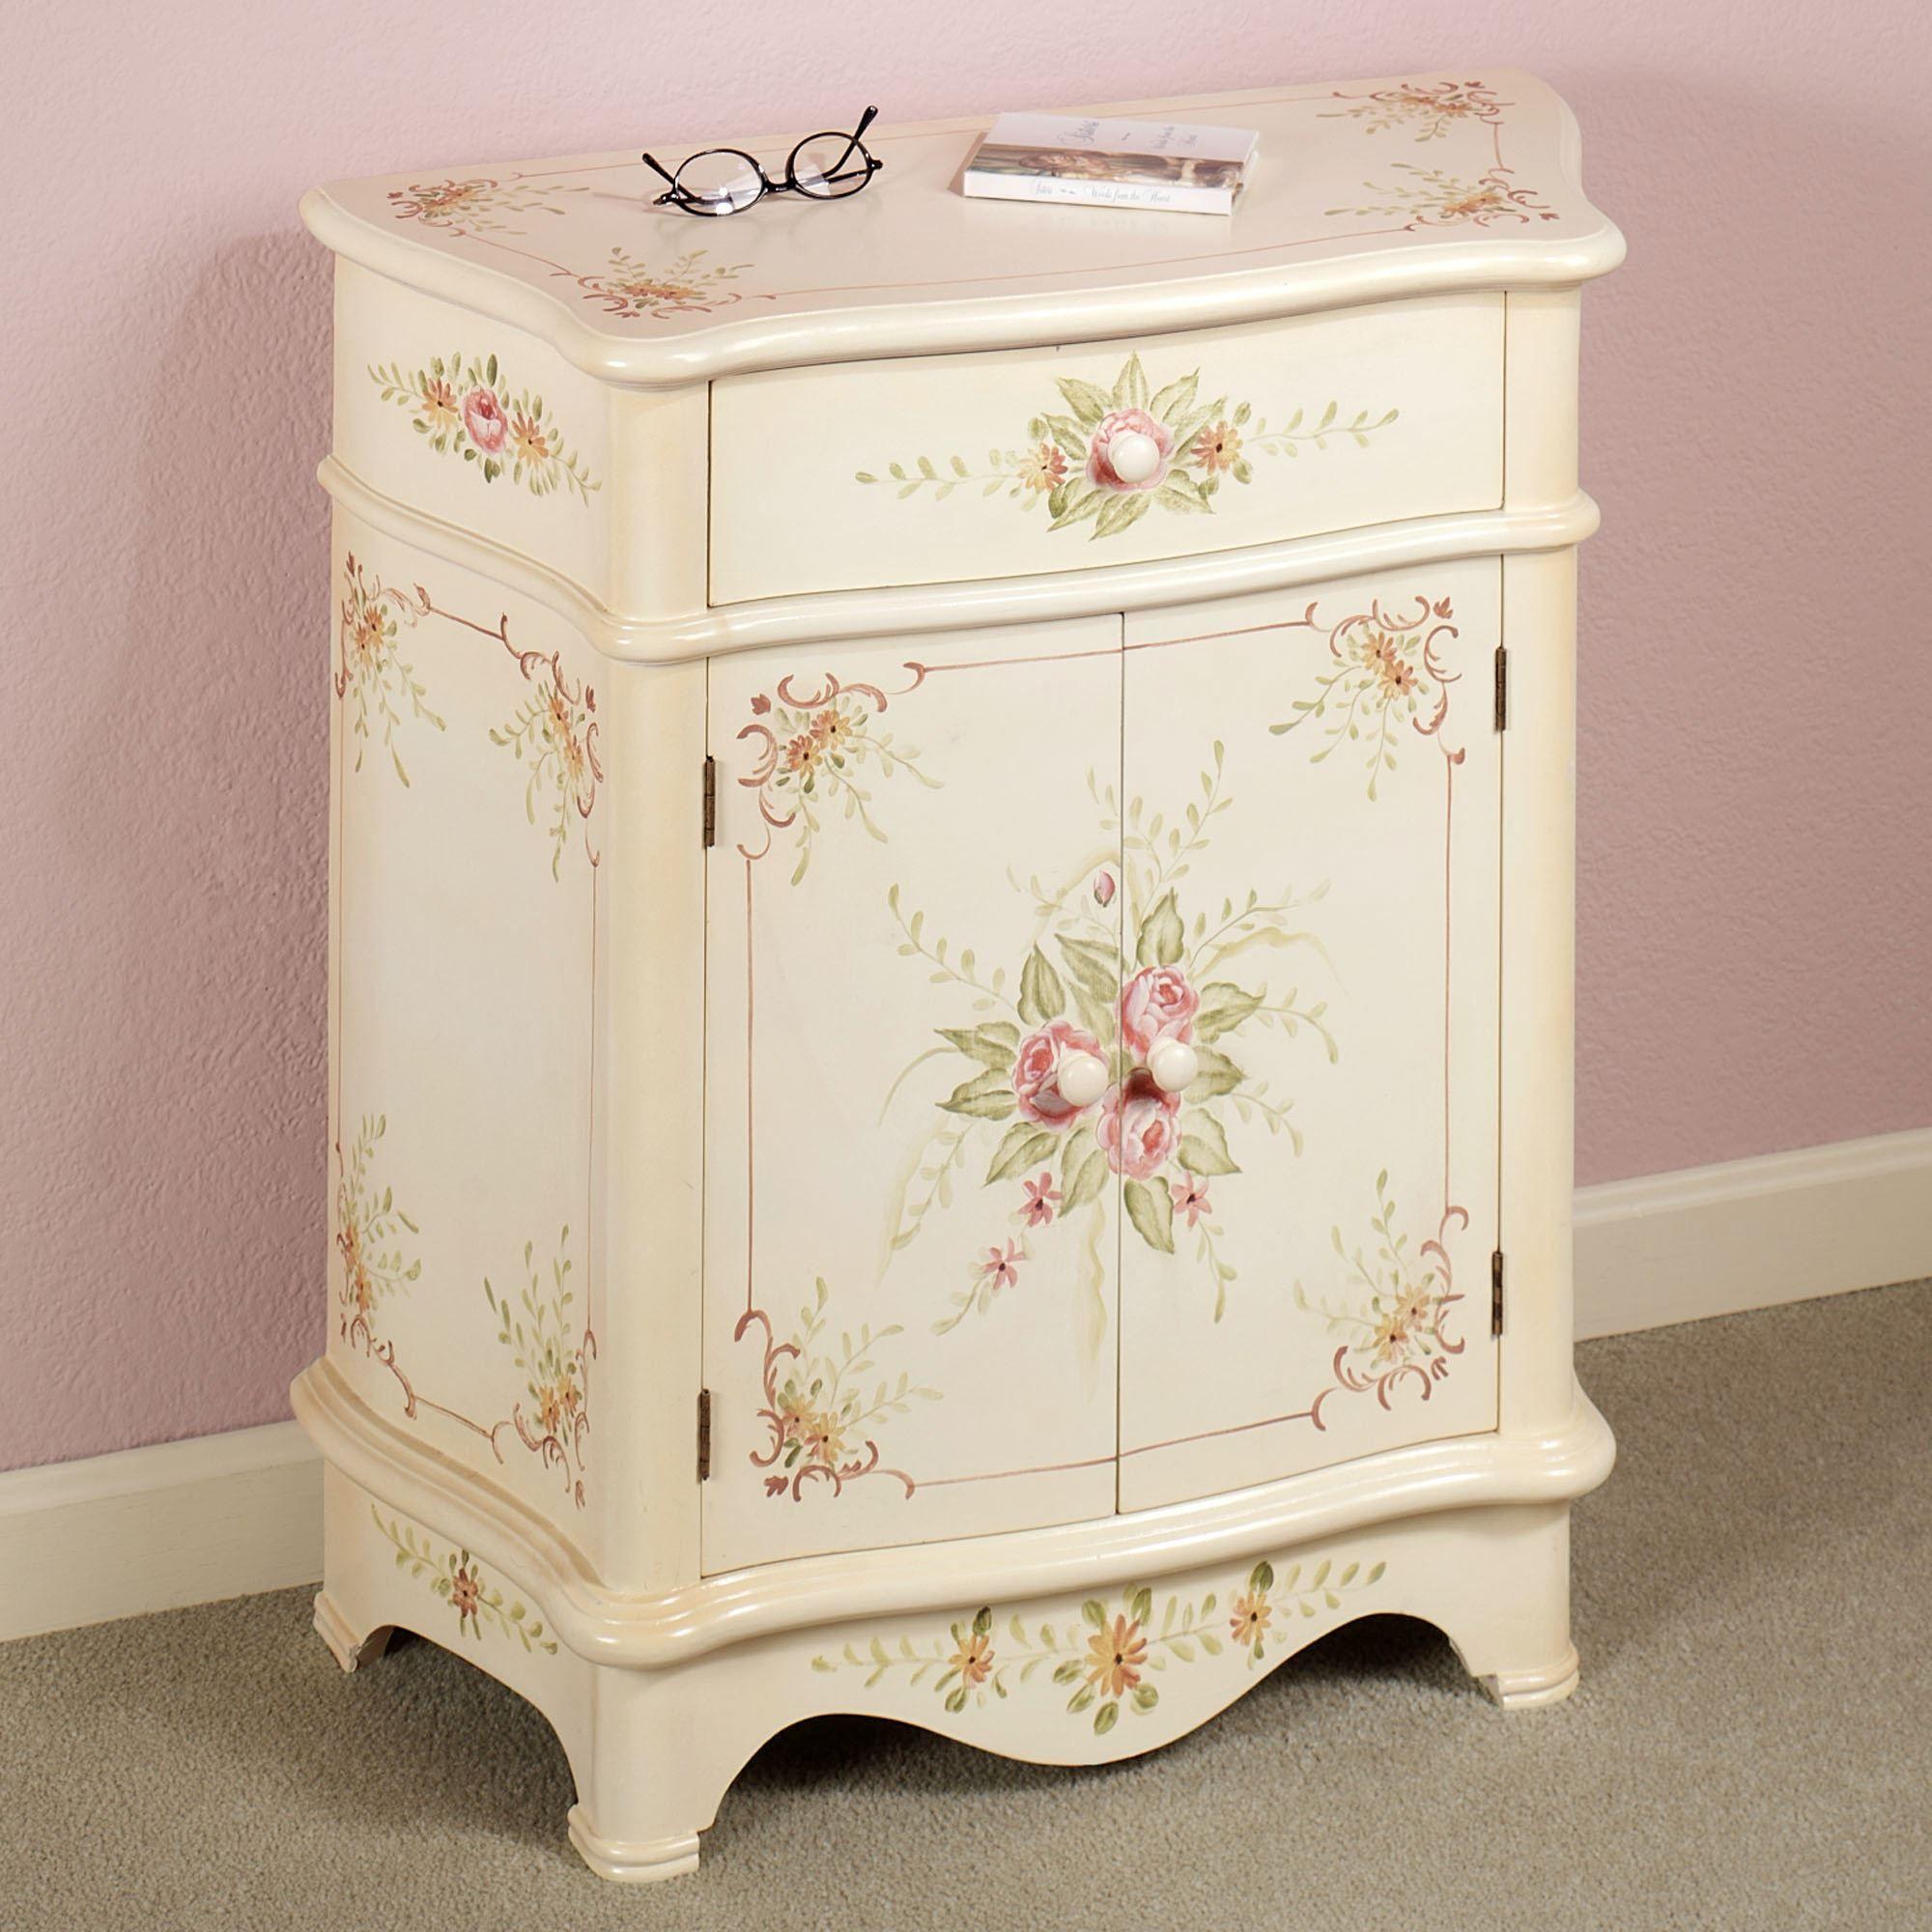 Valeria Handpainted Fl Storage Cabinet